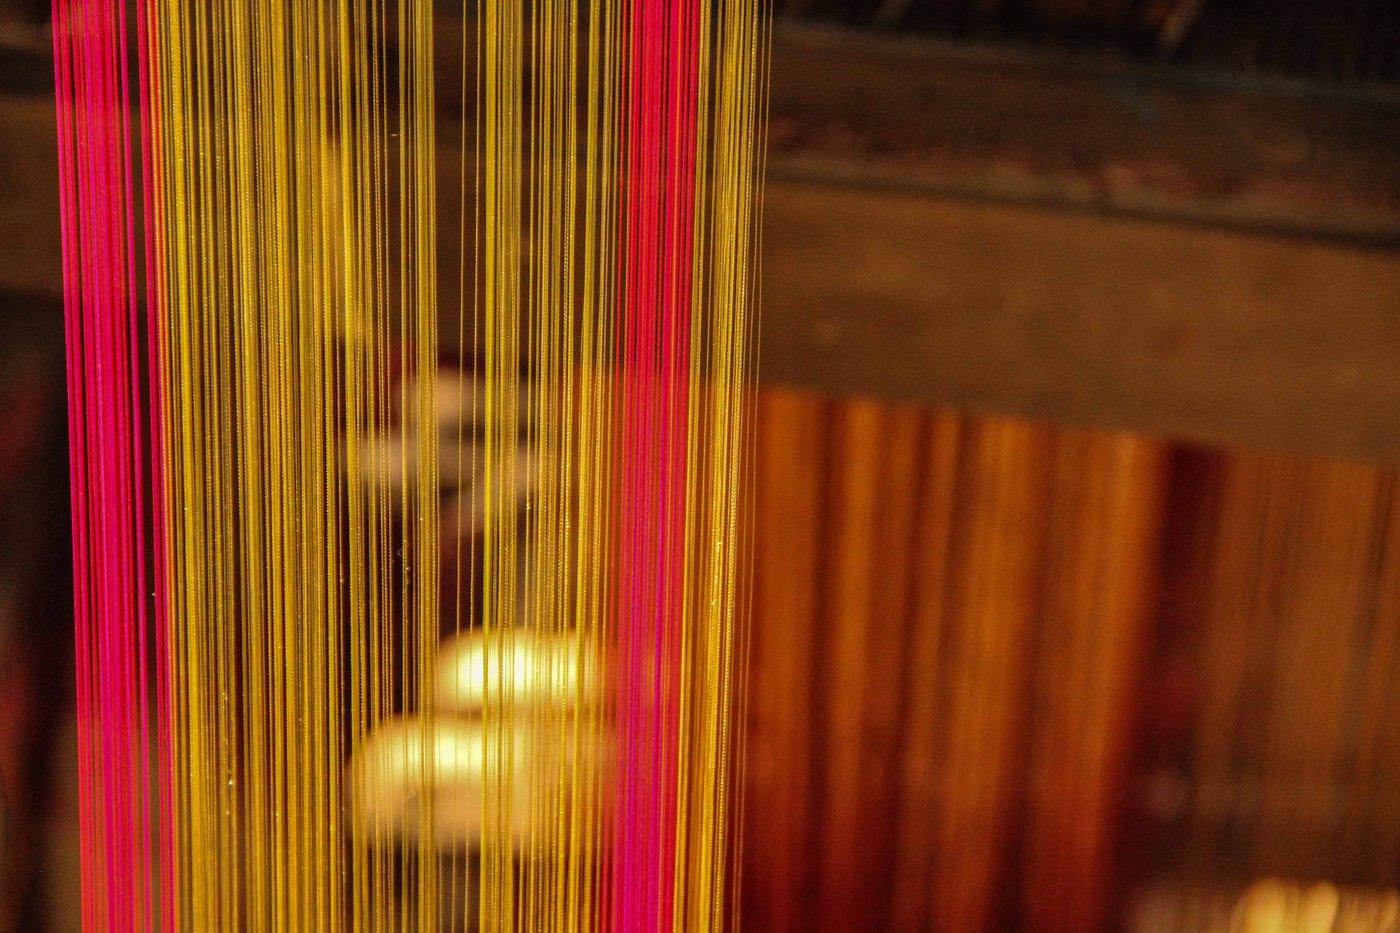 Threadbare in Santipur: The Plight of Handloom Weavers